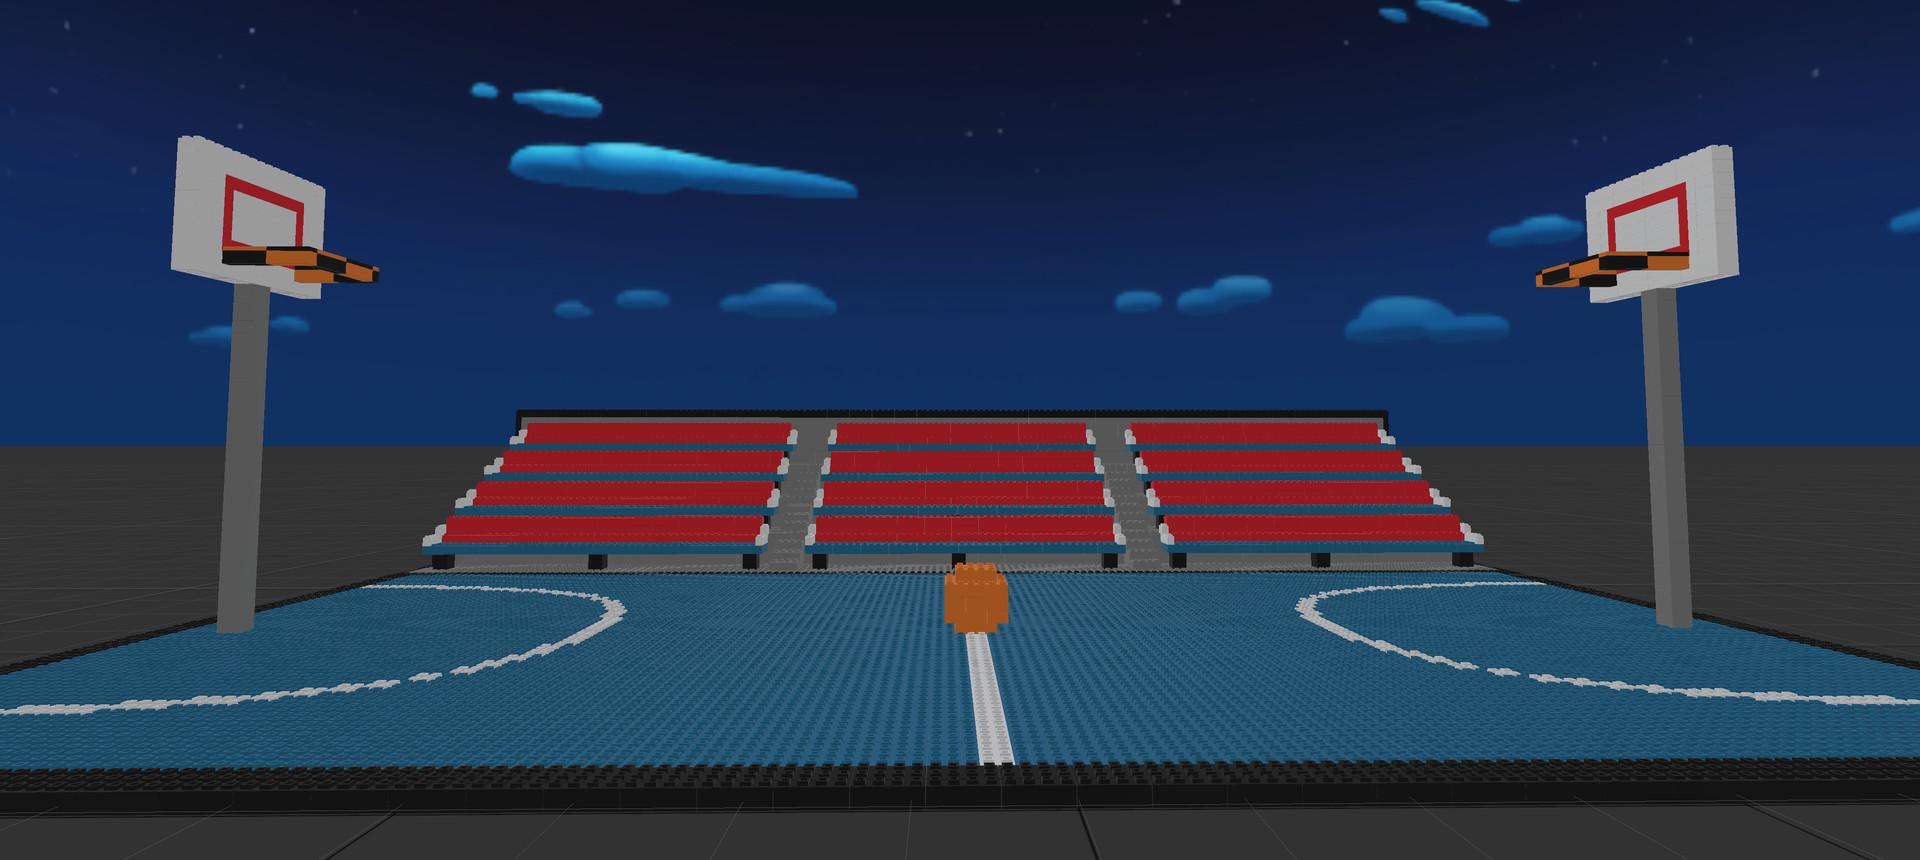 Oculus Quest 游戏《BricksVR》虚拟像素插图(2)